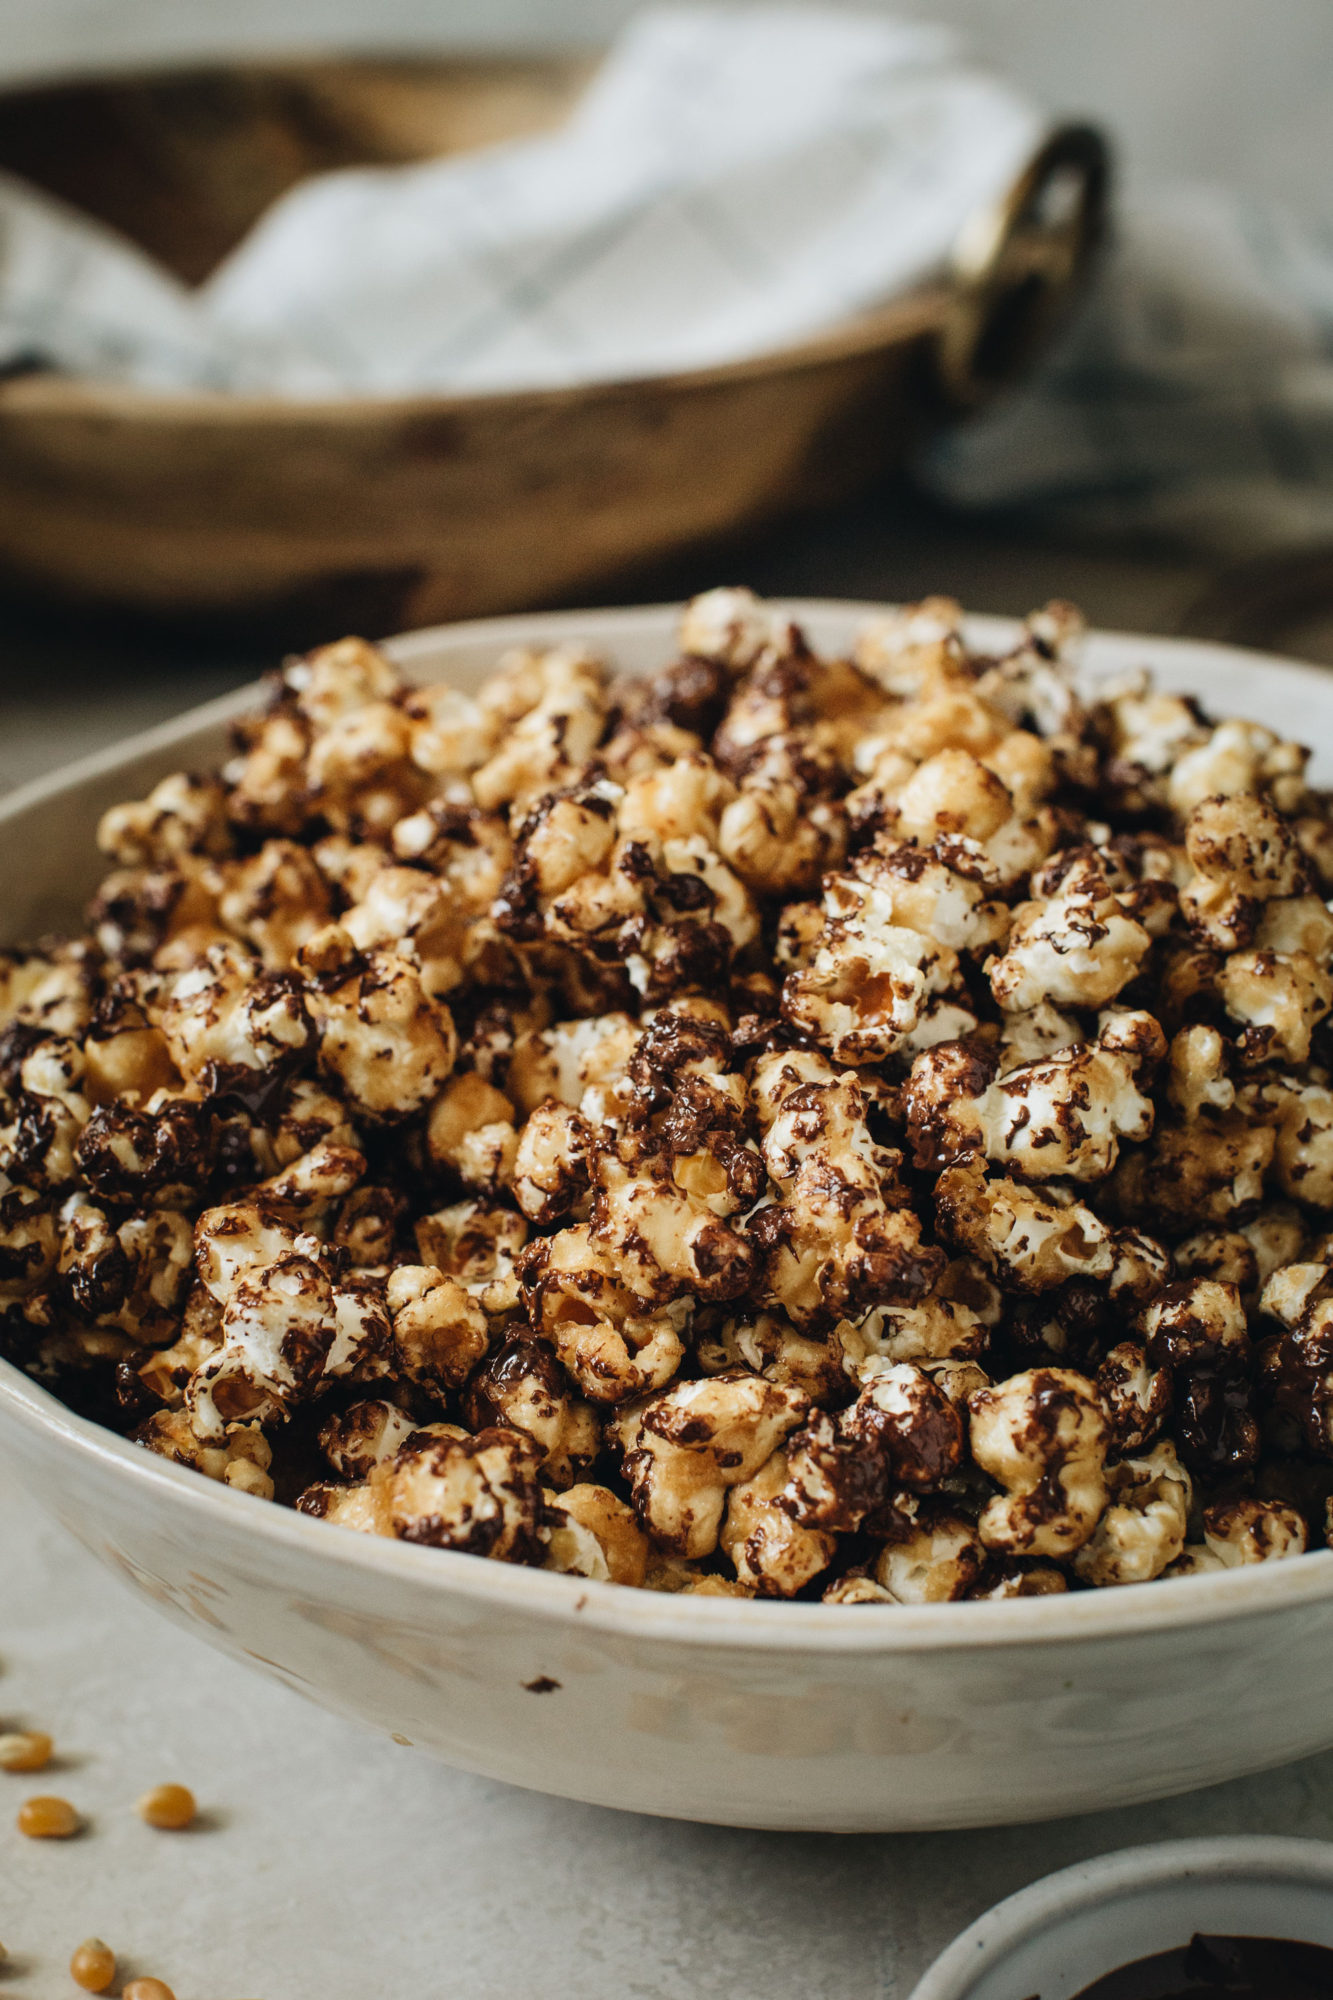 chocolate caramel popcorn in white bowl